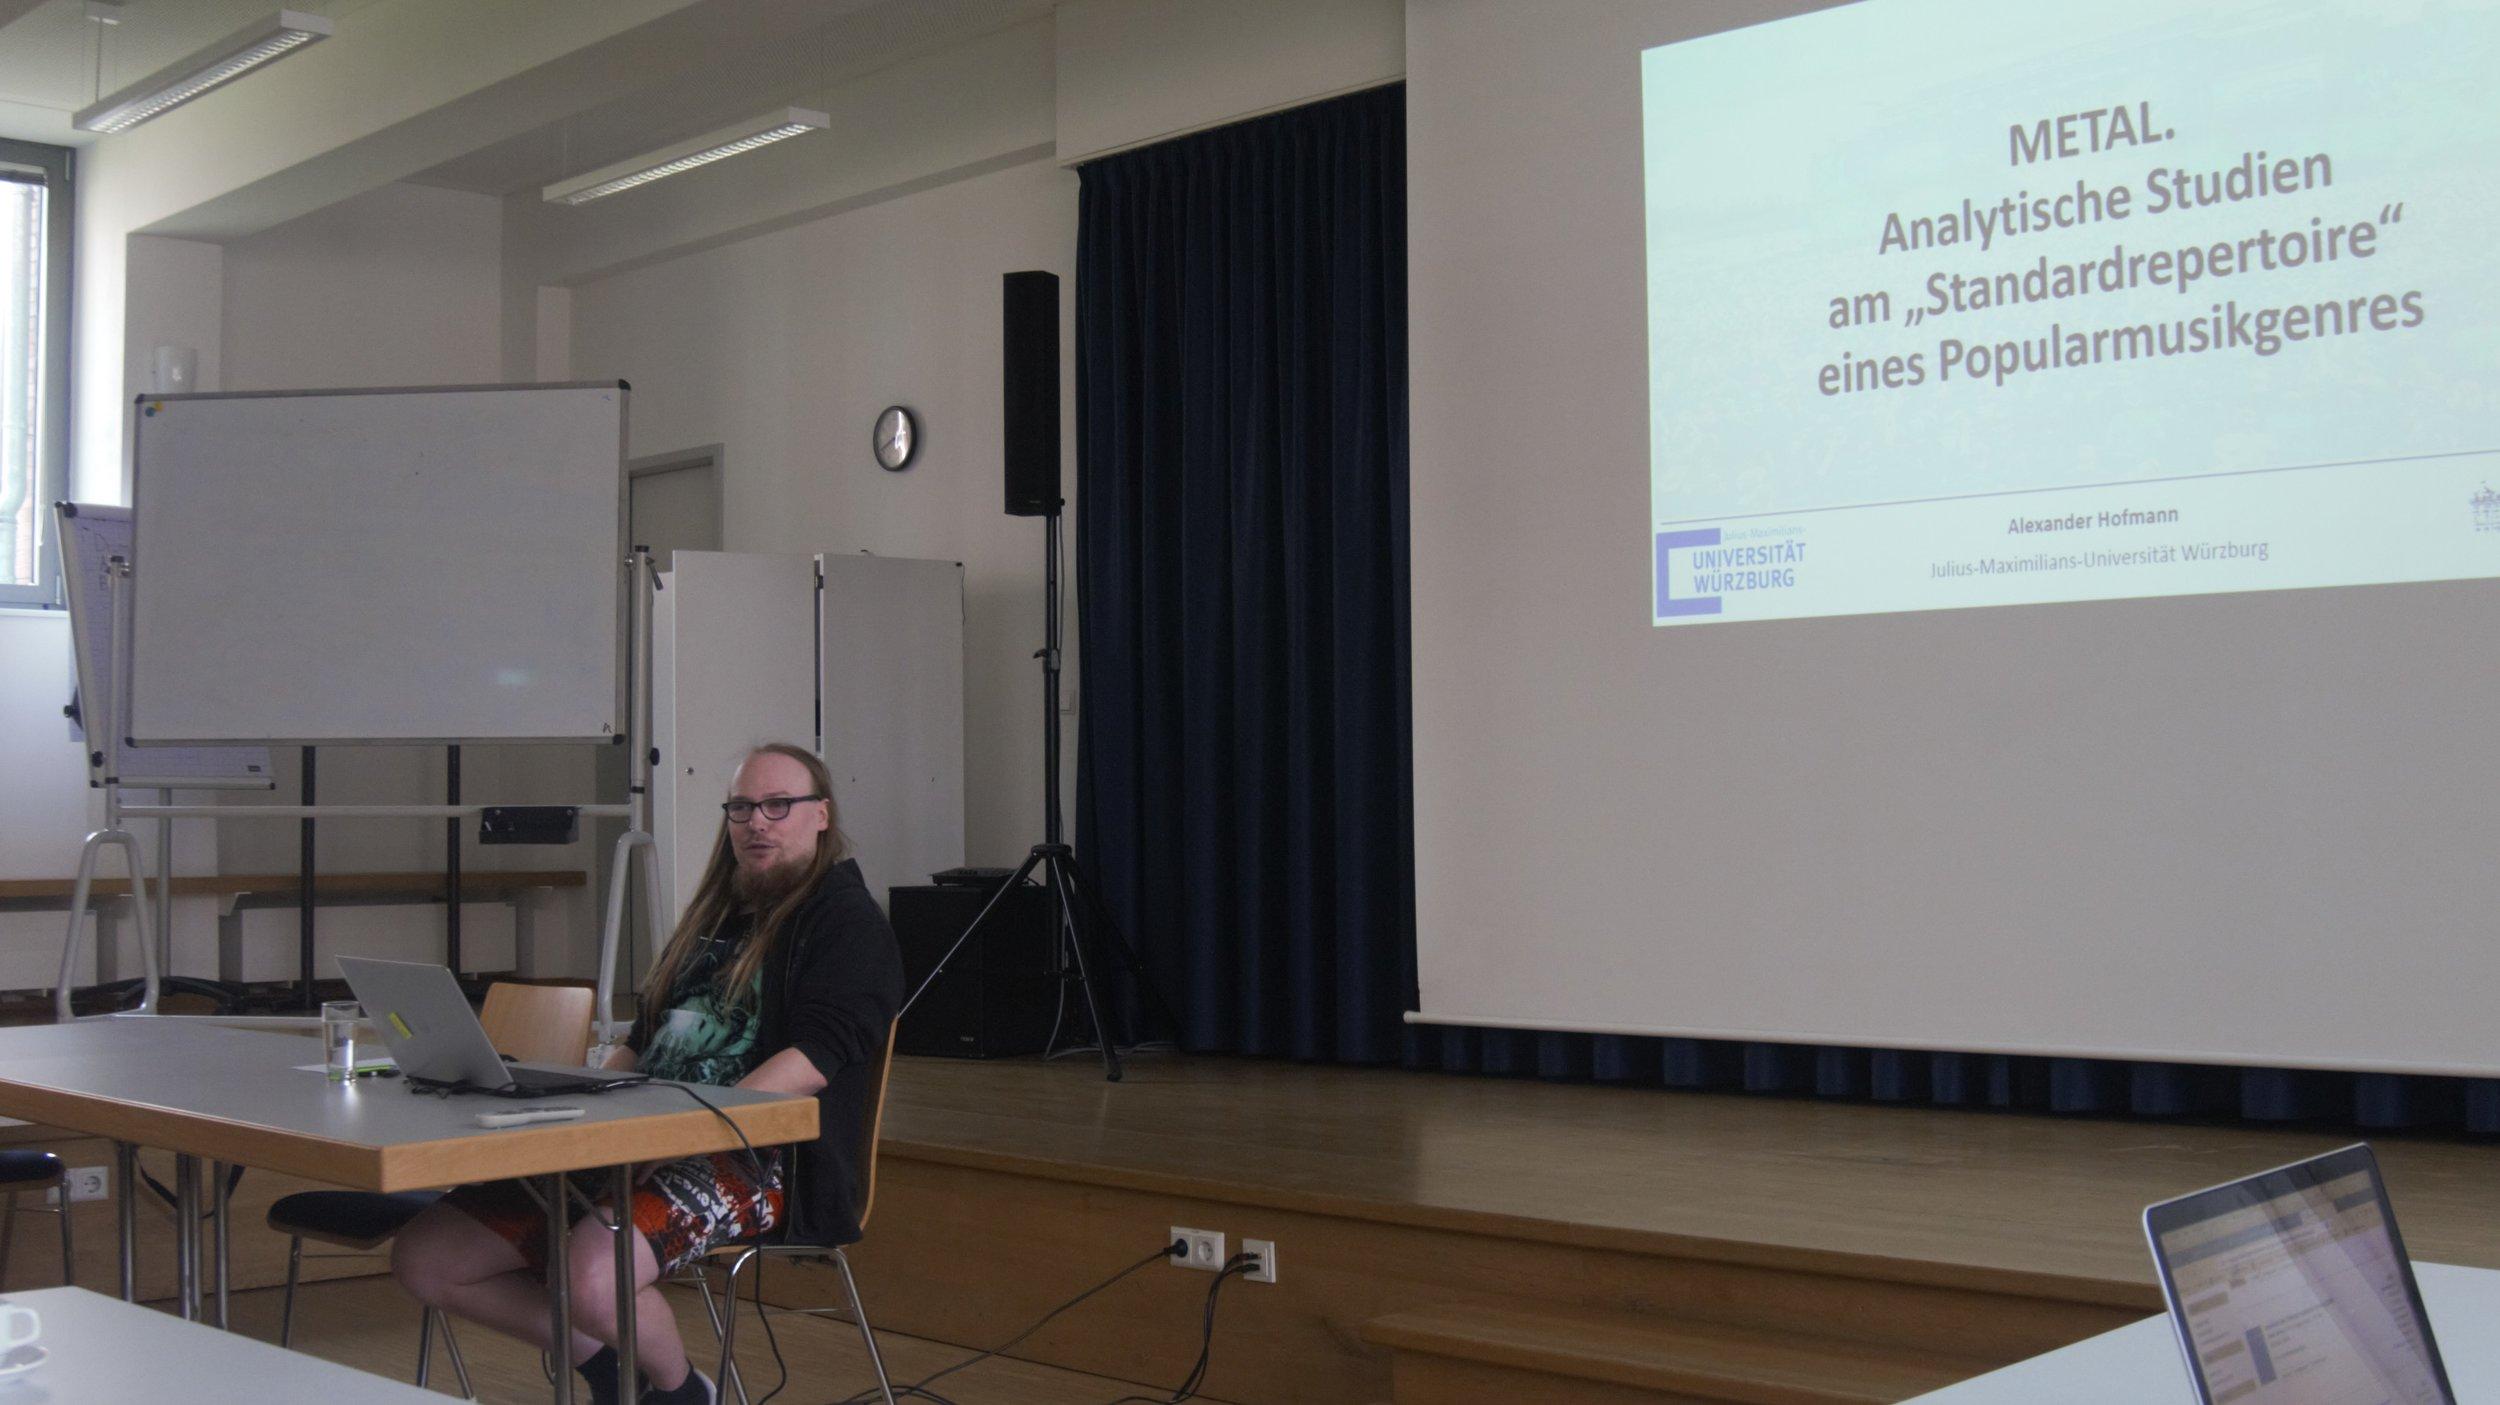 CMP Braunschweig 17.05.2019 - Alexander Hofmann (Universität Würzburg)